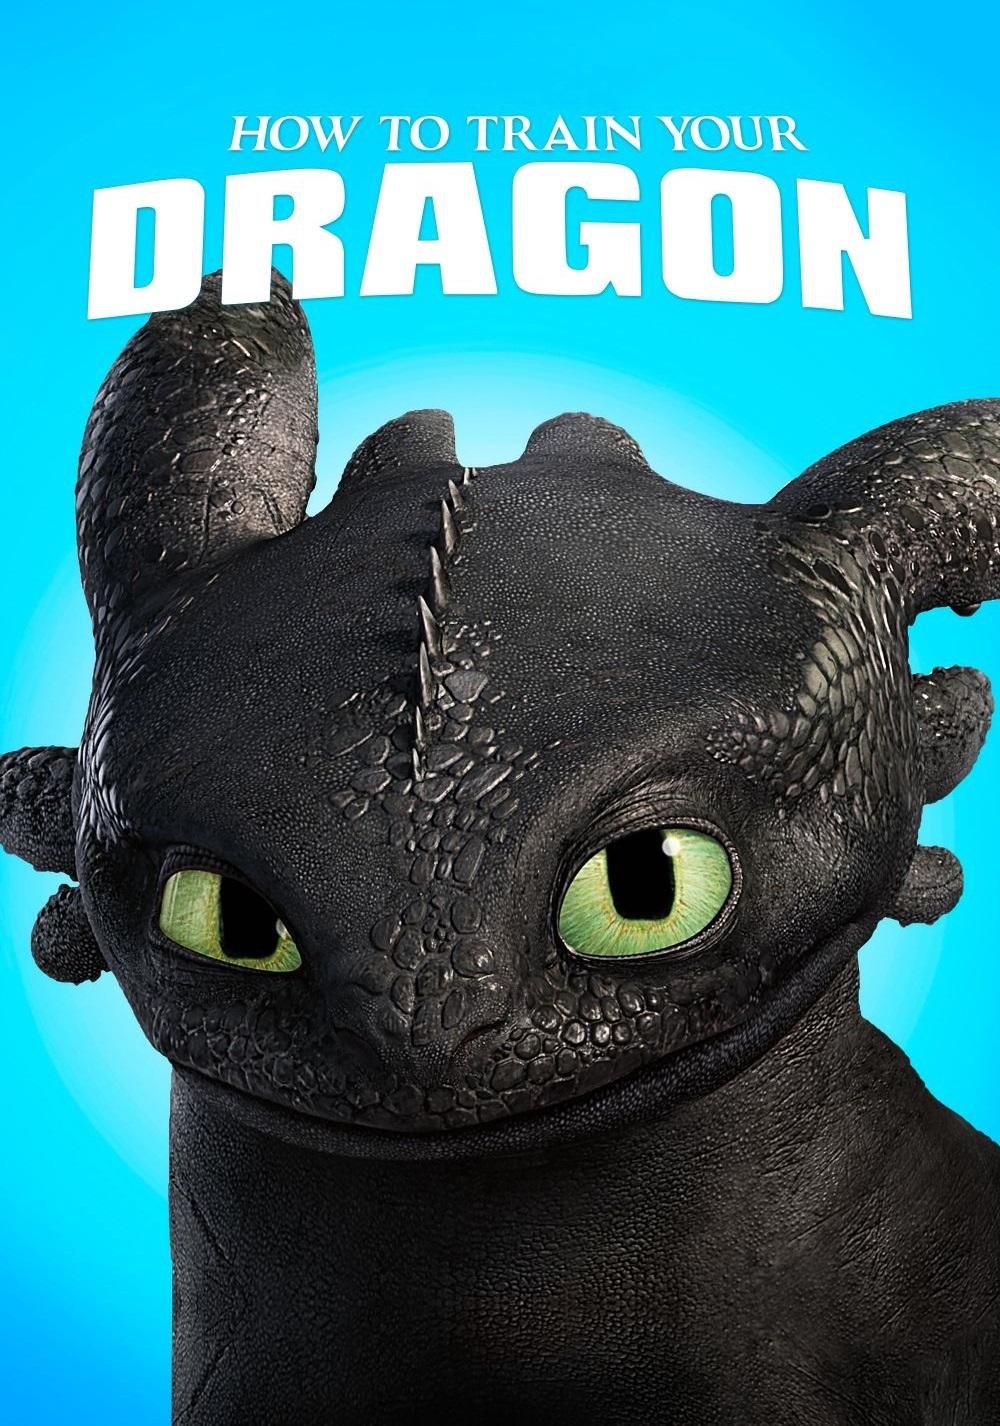 How to Train Your Dragon | Movie fanart | fanart.tv - photo#27